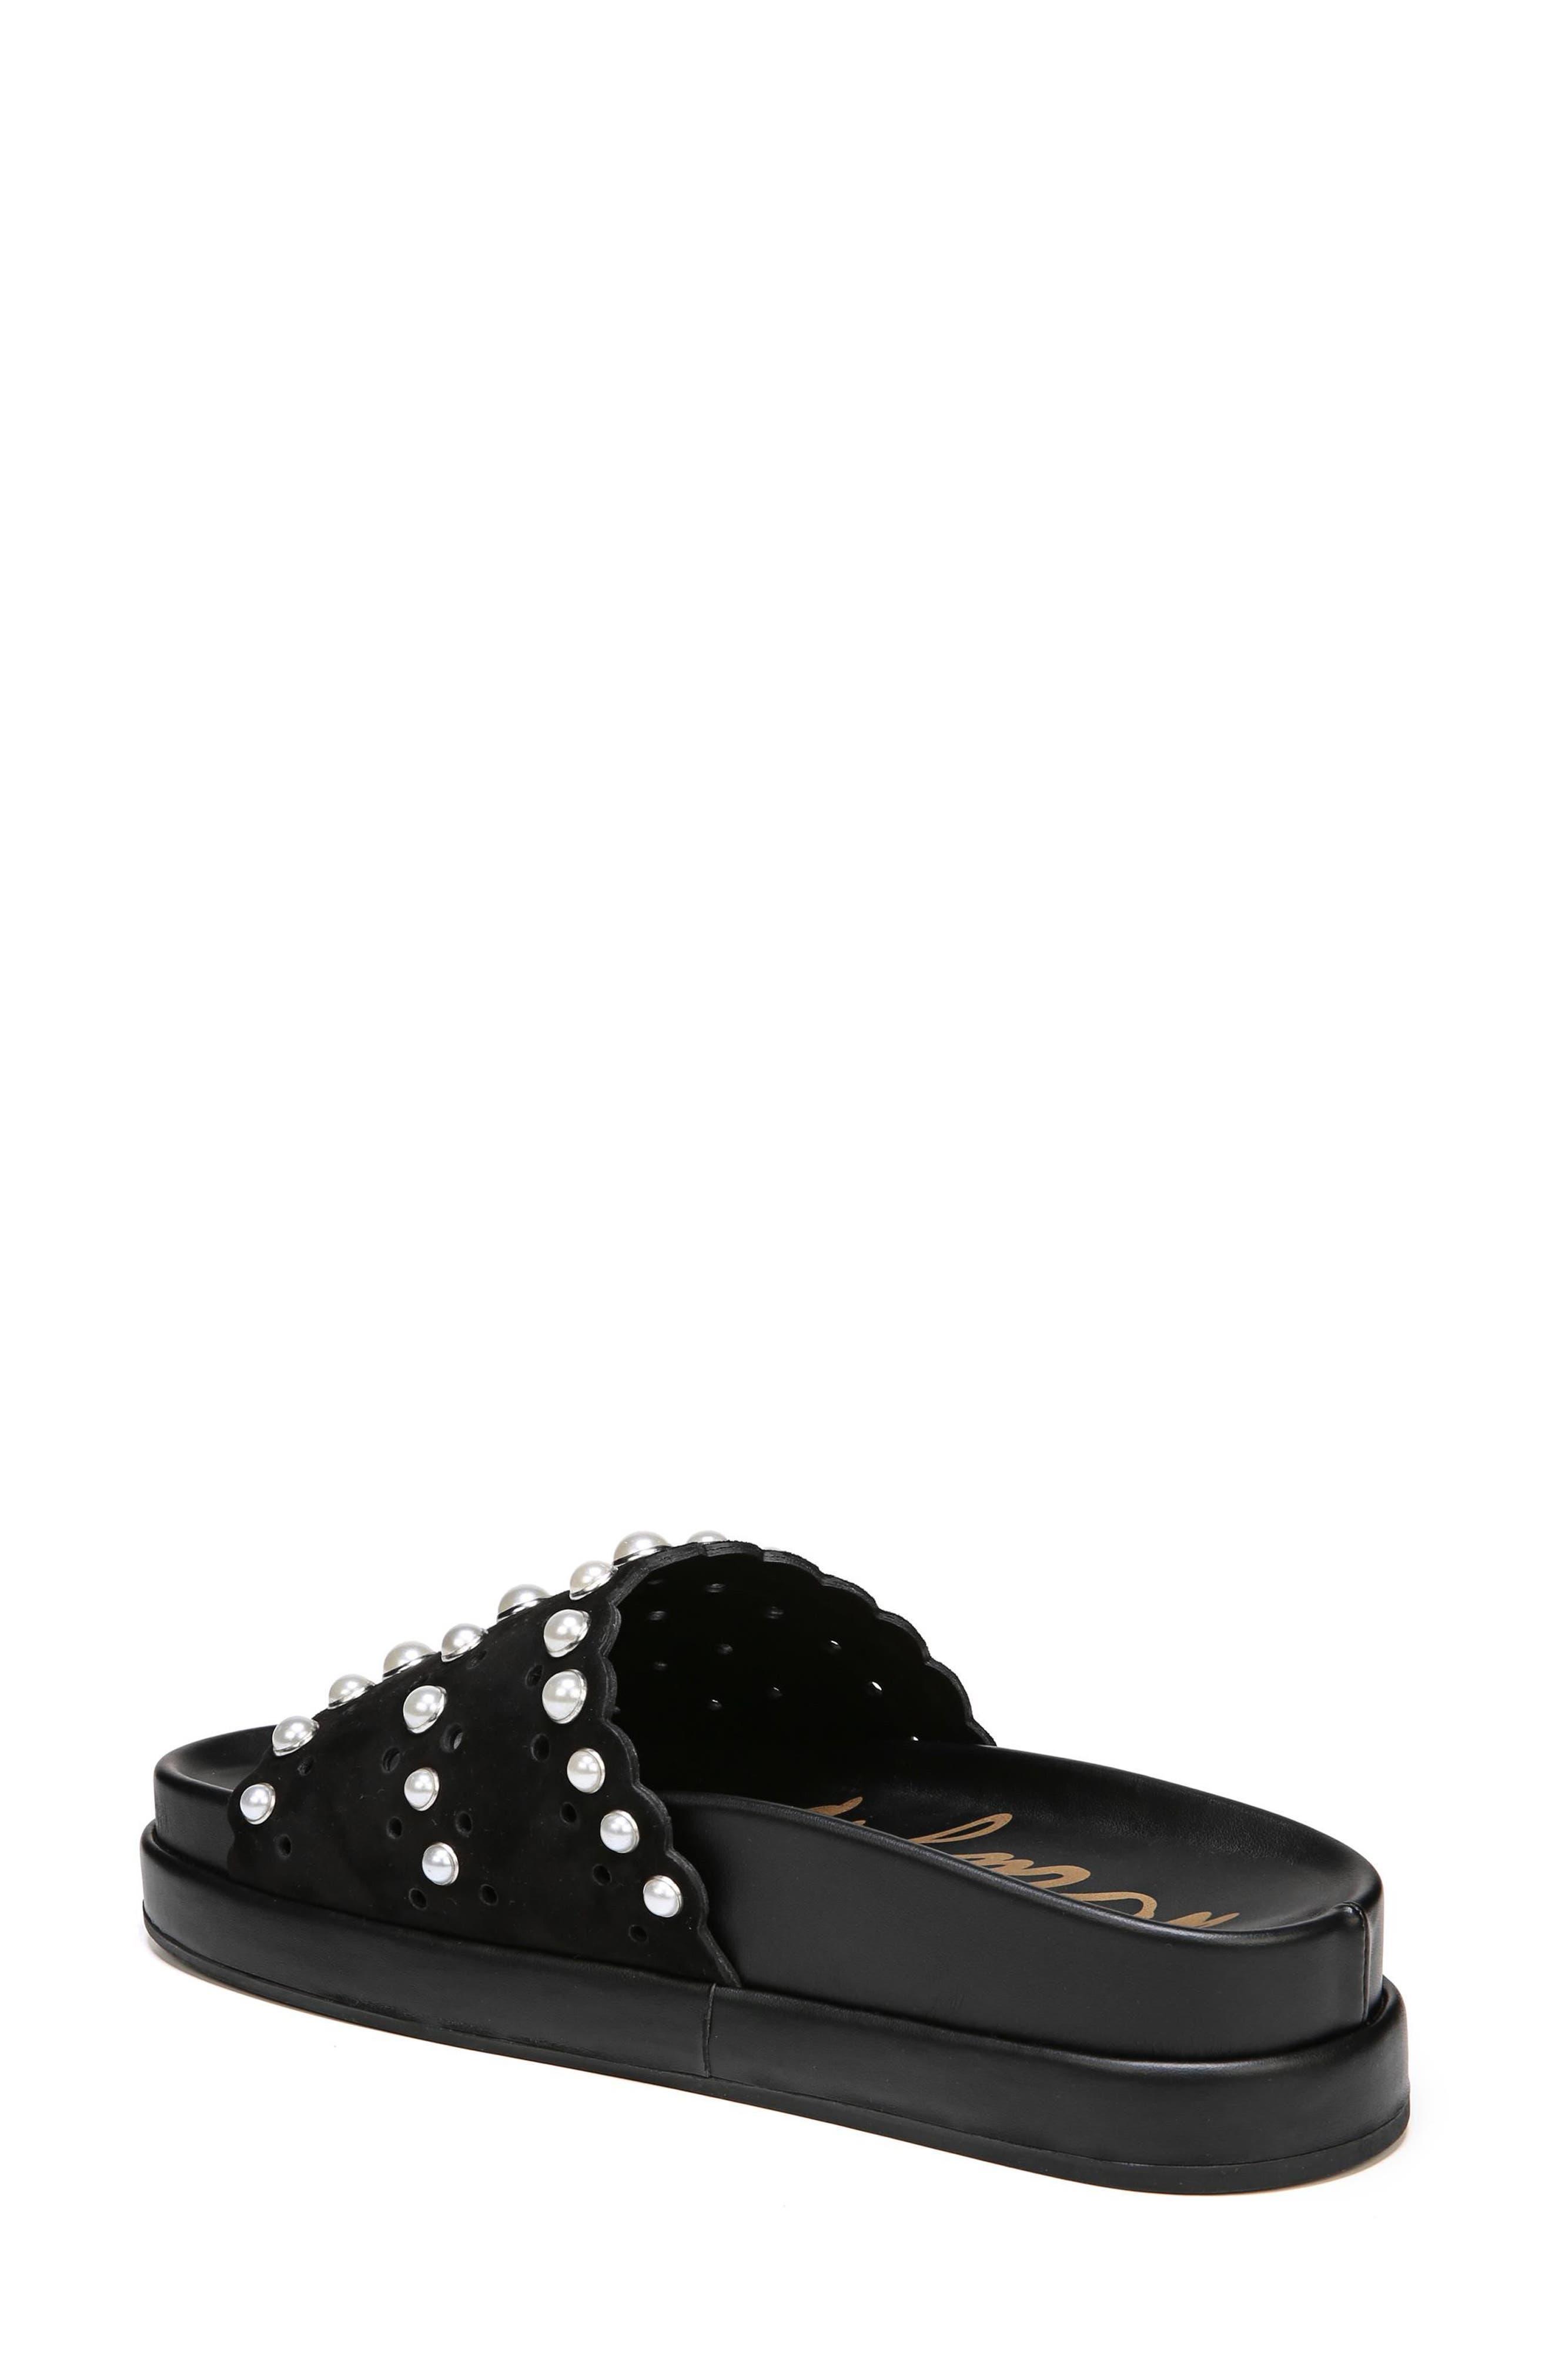 Sera Slide Sandal,                             Alternate thumbnail 2, color,                             BLACK SUEDE